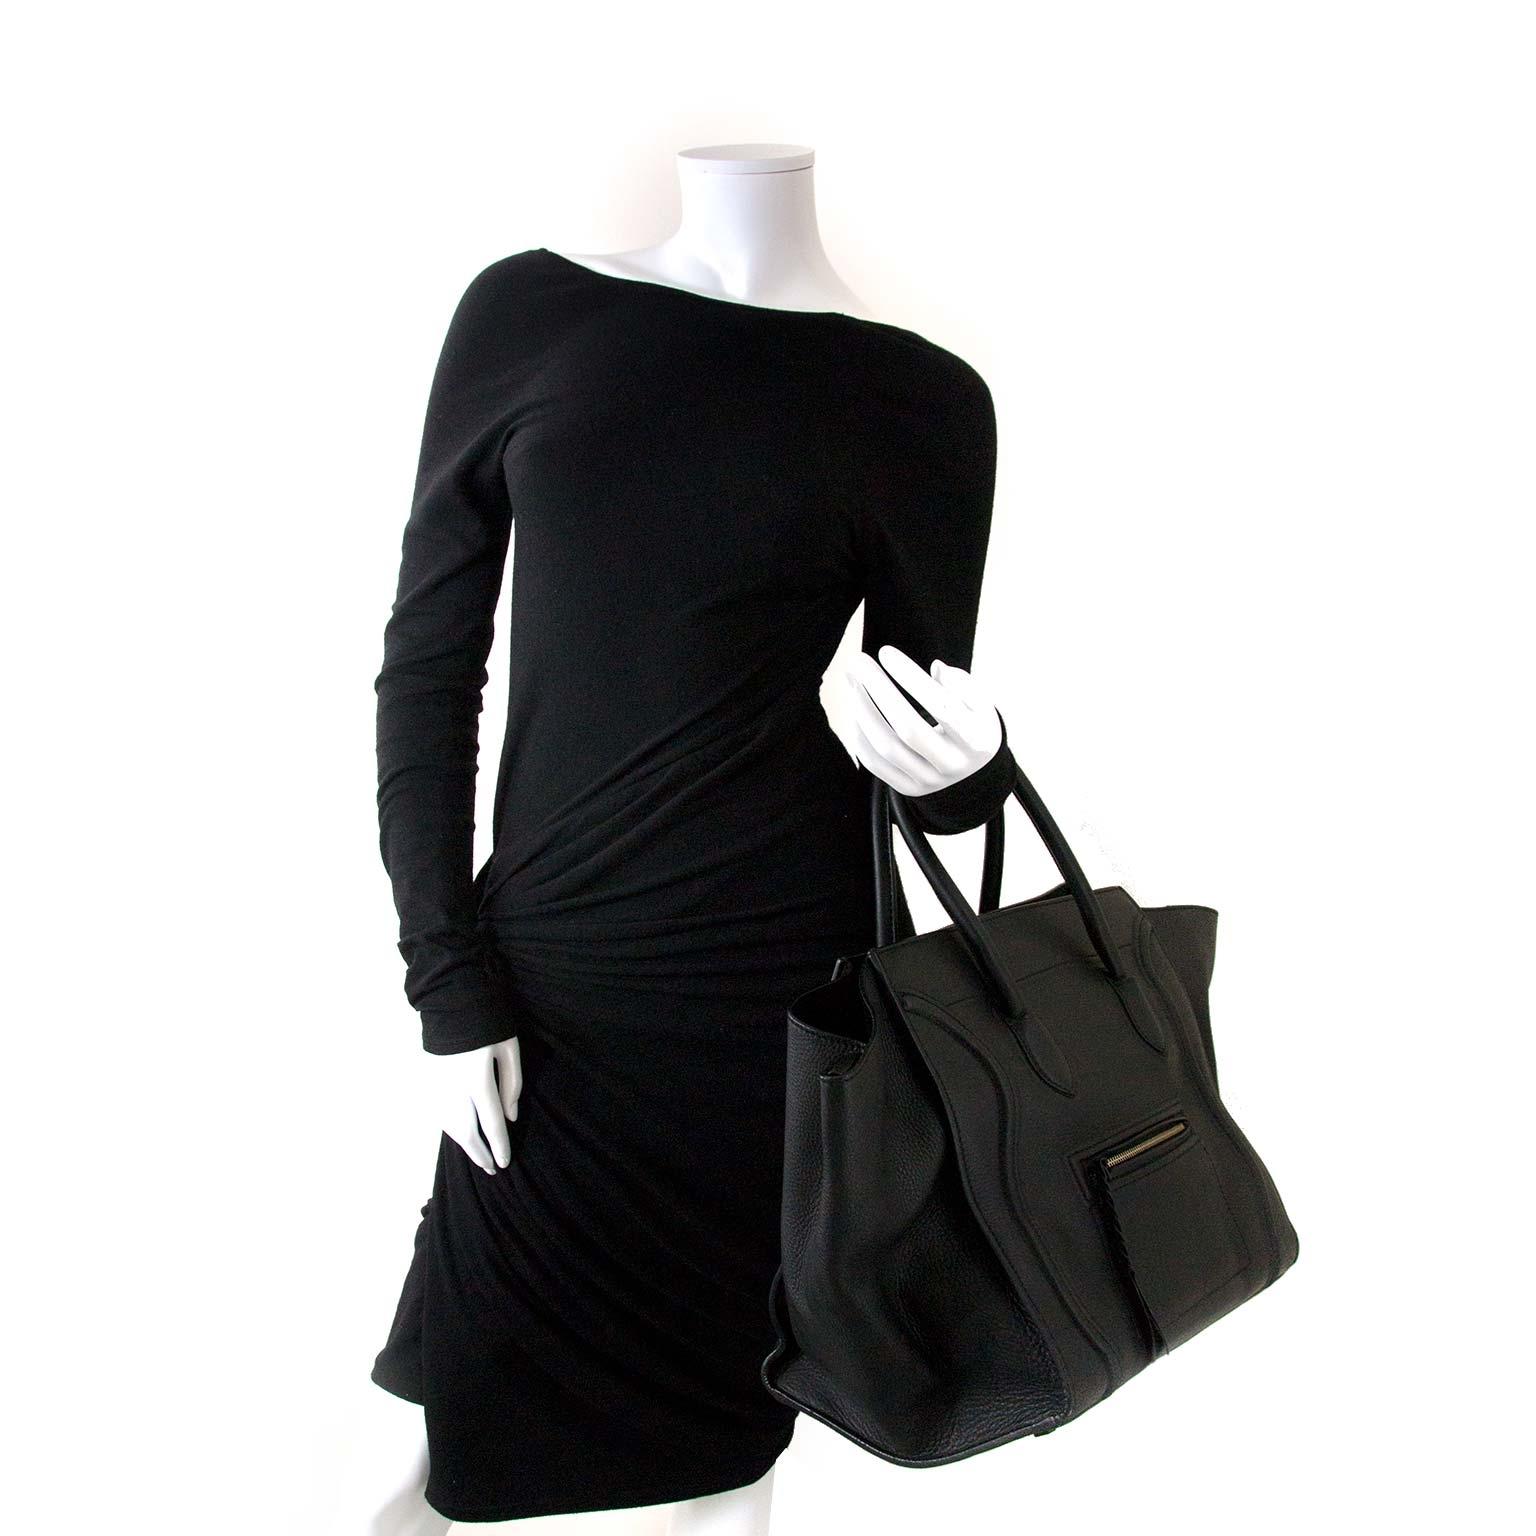 buy Céline Black leather Phantom Handbag at labellov for the best price